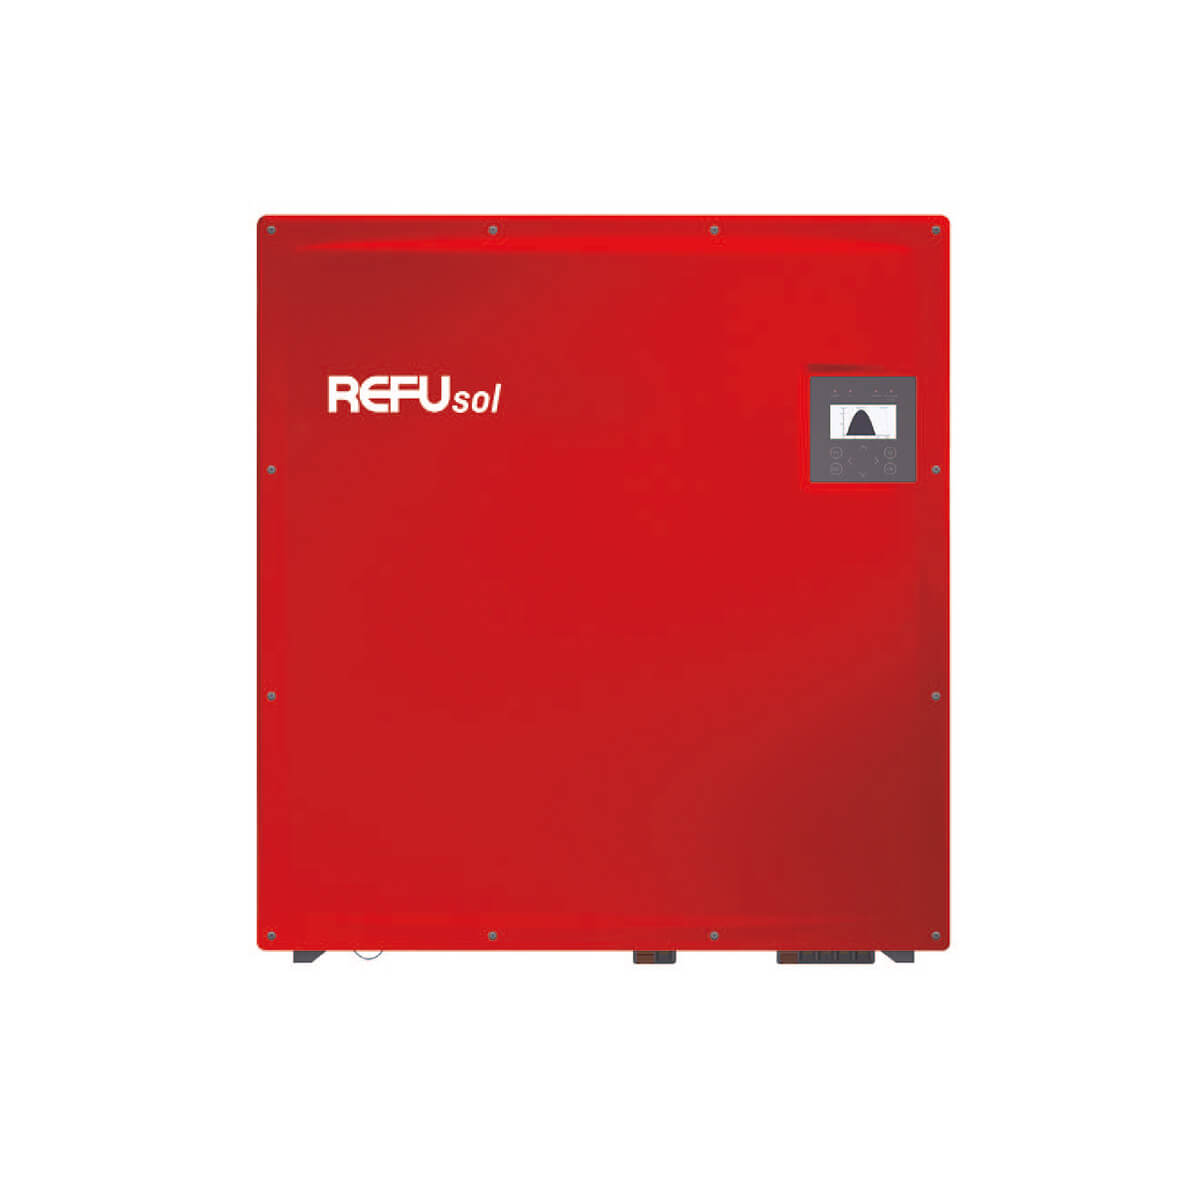 refusol 40kW inverter, refusol 40k 40kW inverter, refusol 40k inverter, refusol 40k, refusol 40k 40 kW, REFUSOL 40 KW